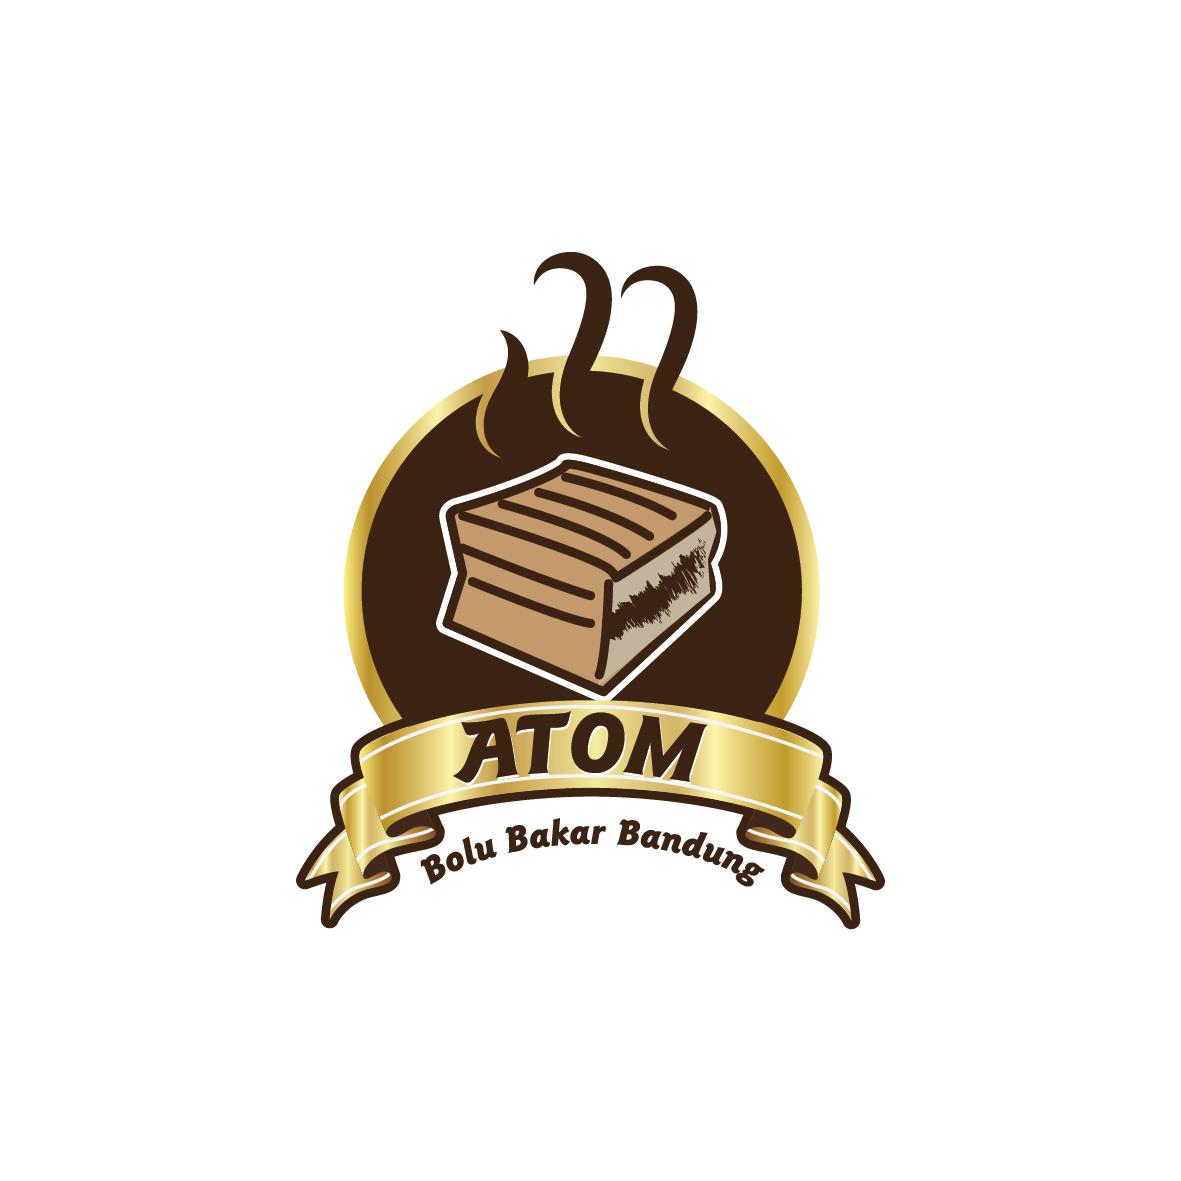 Contoh Gambar Ilustrasi Logo